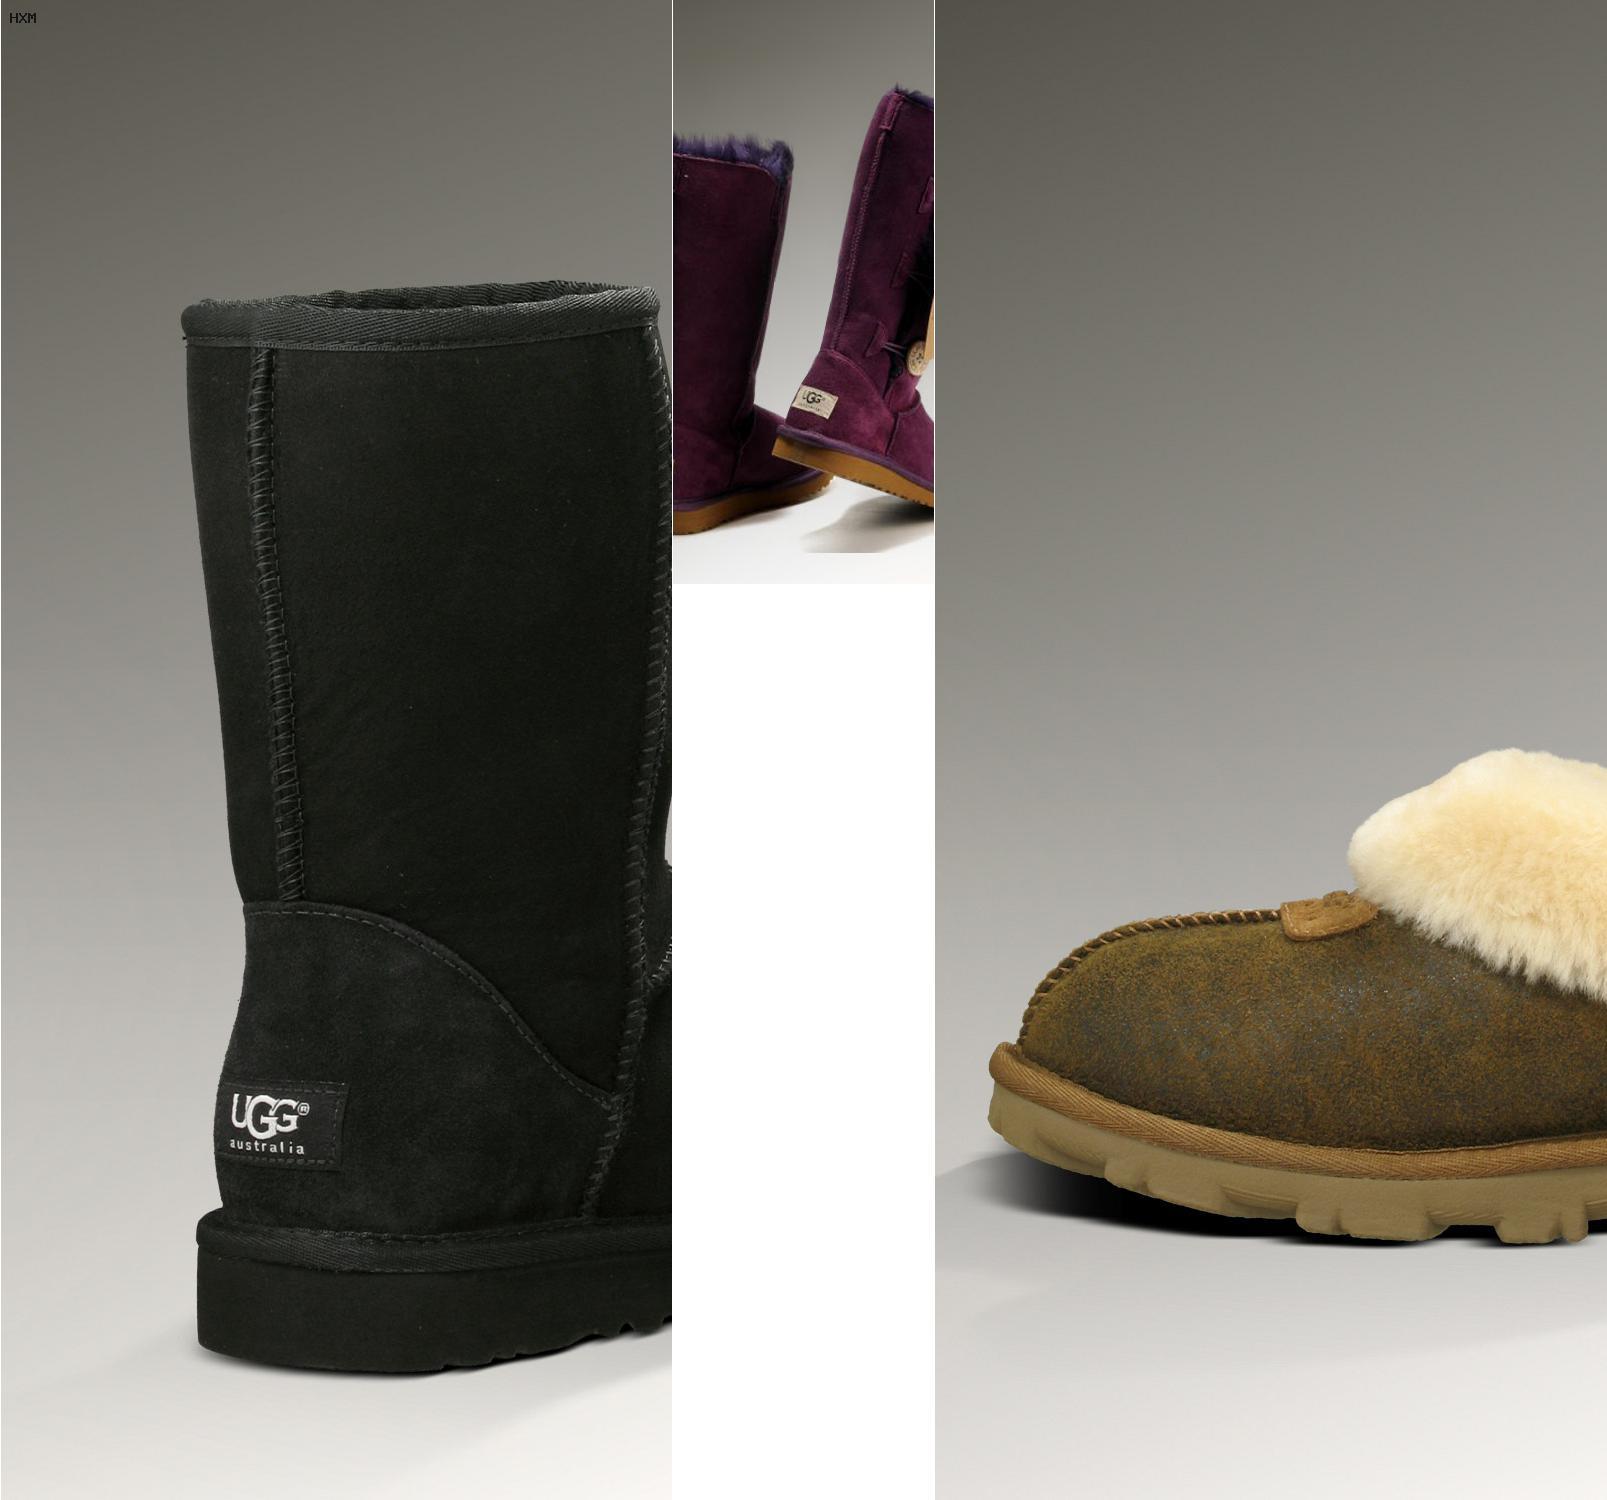 ugg black niels ii ankle boot